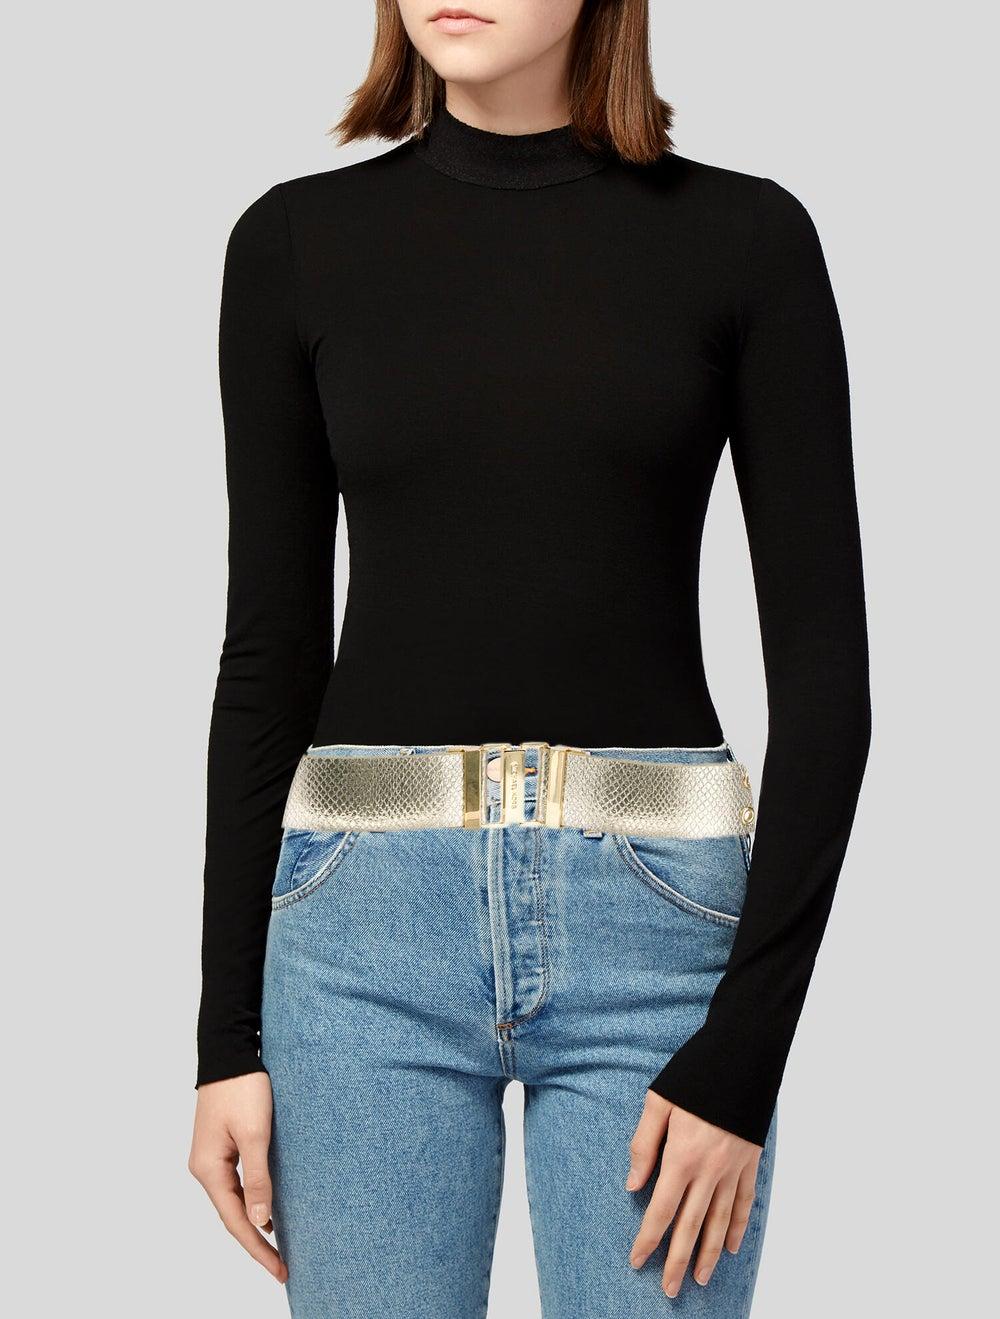 Michael Kors Leather Waist Belt Gold - image 2